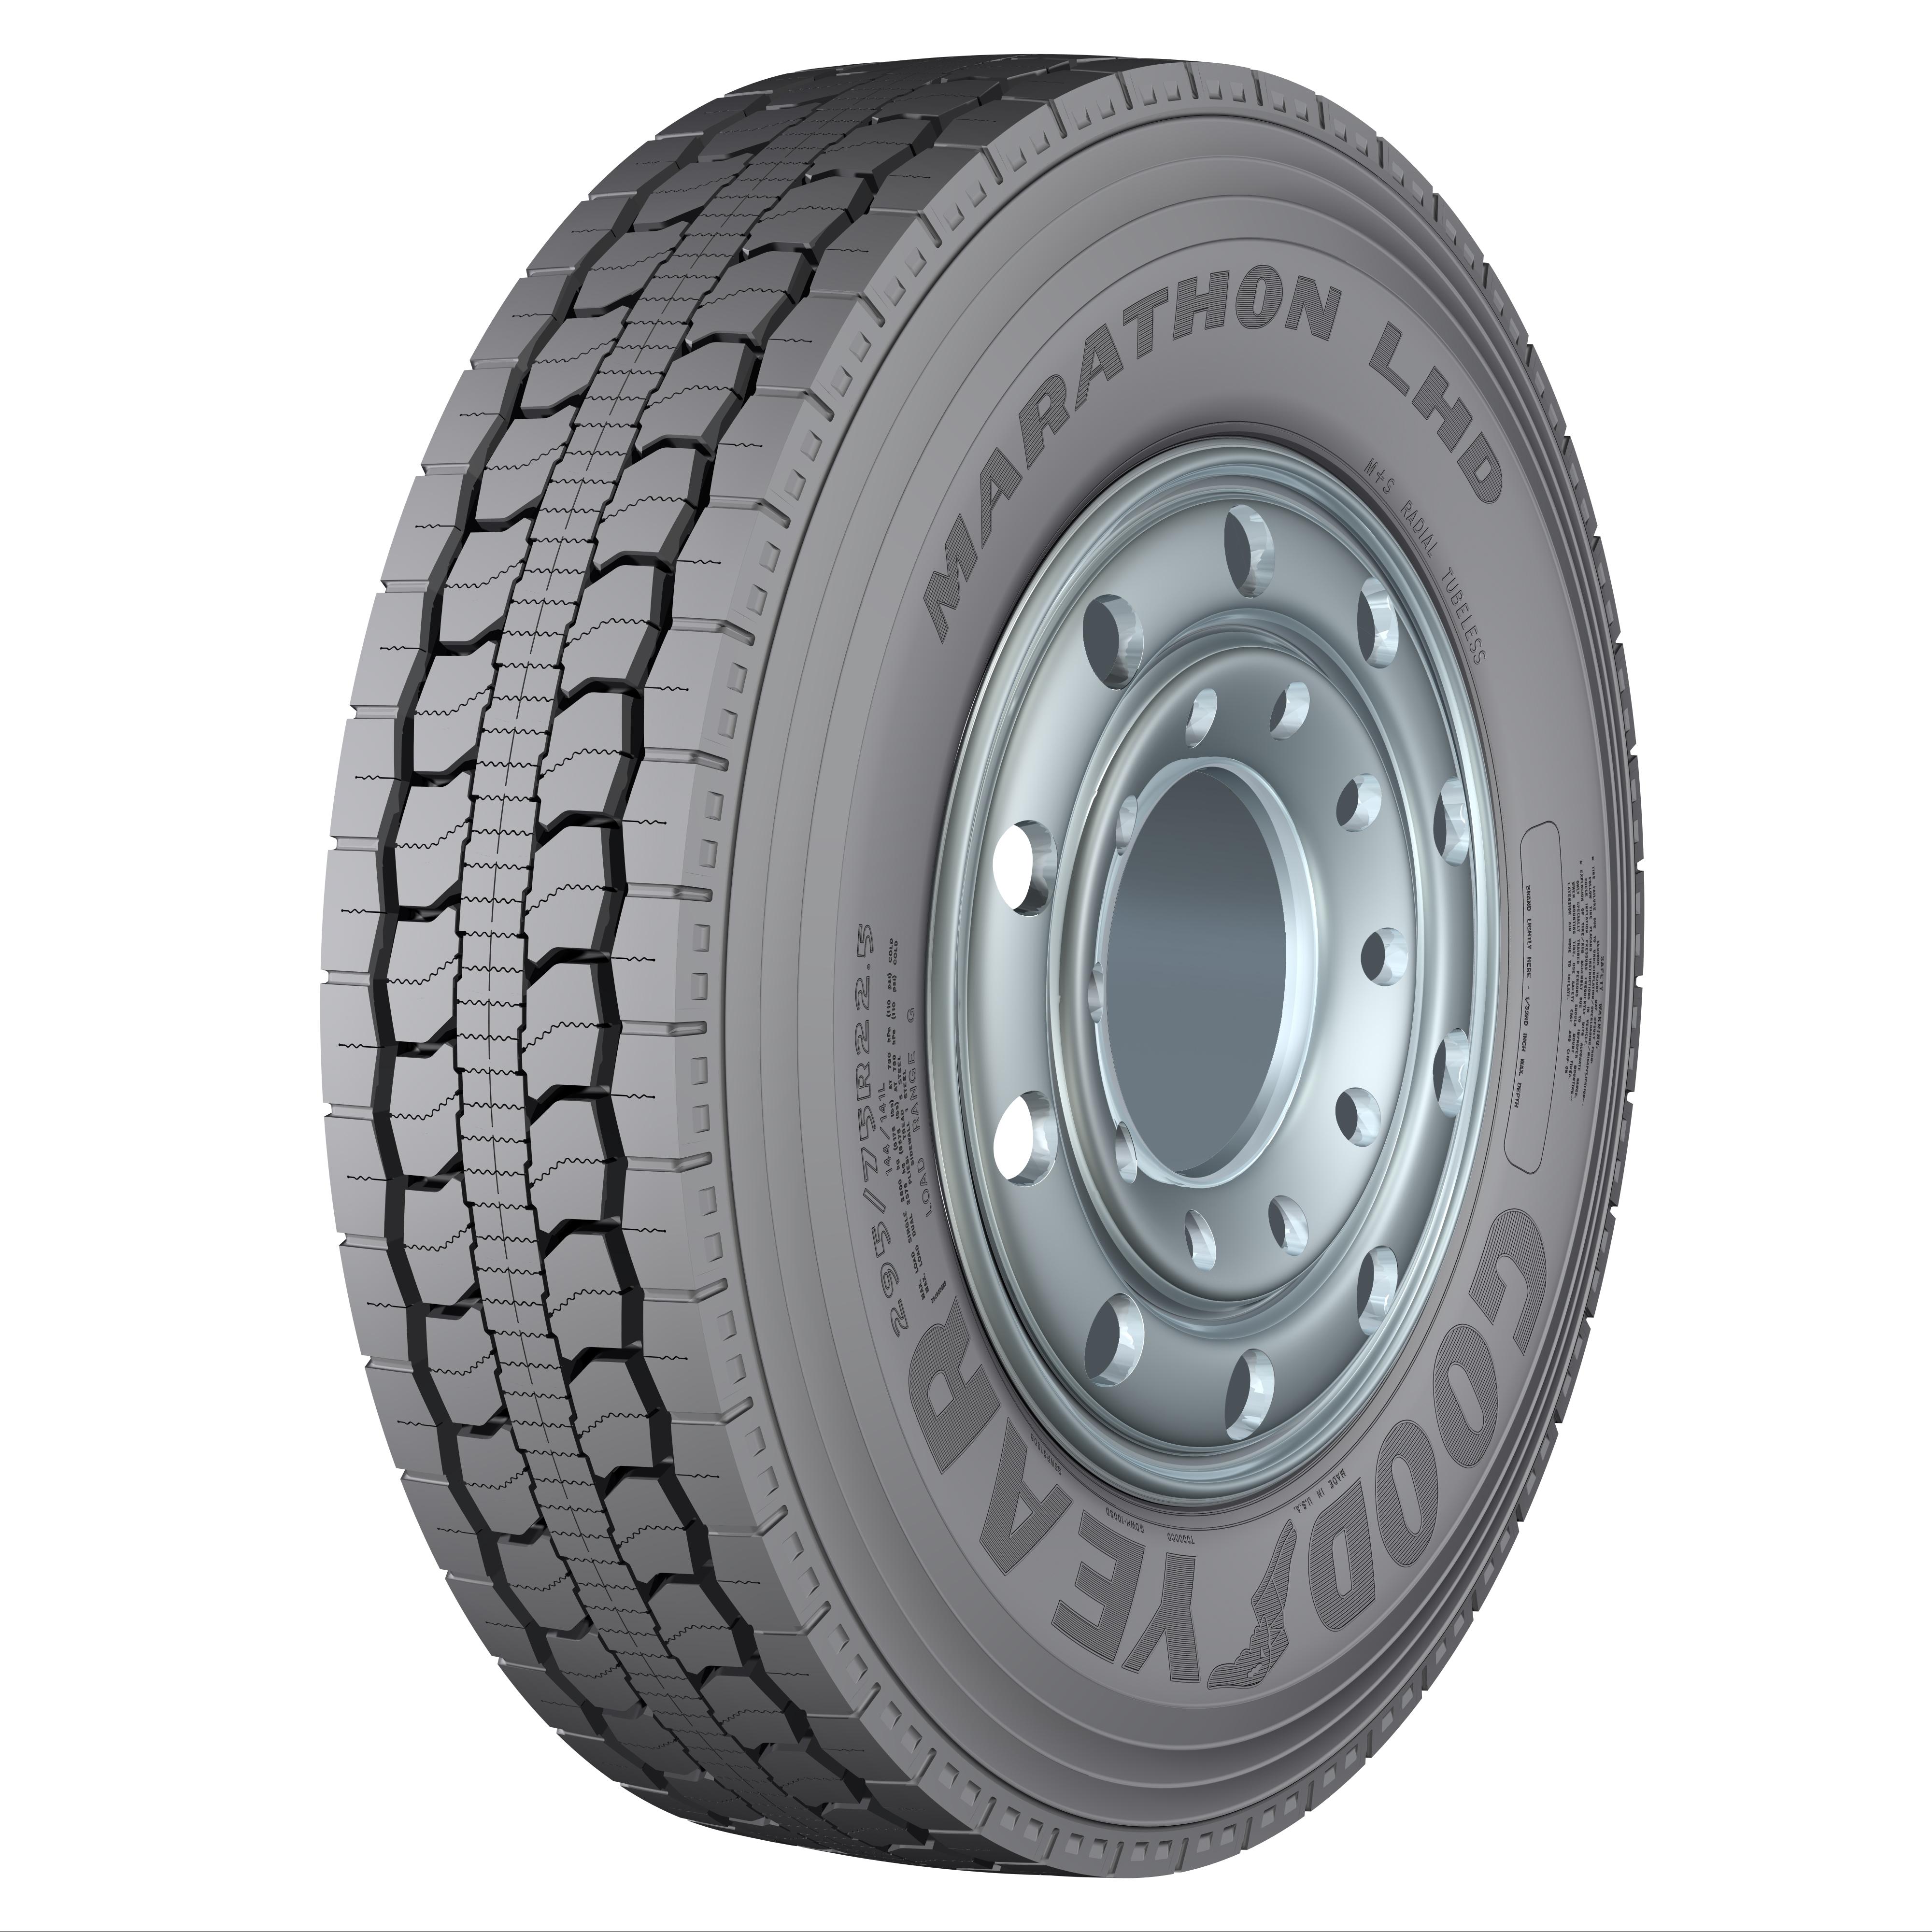 goodyear rolls out new marathon tire line truck news. Black Bedroom Furniture Sets. Home Design Ideas